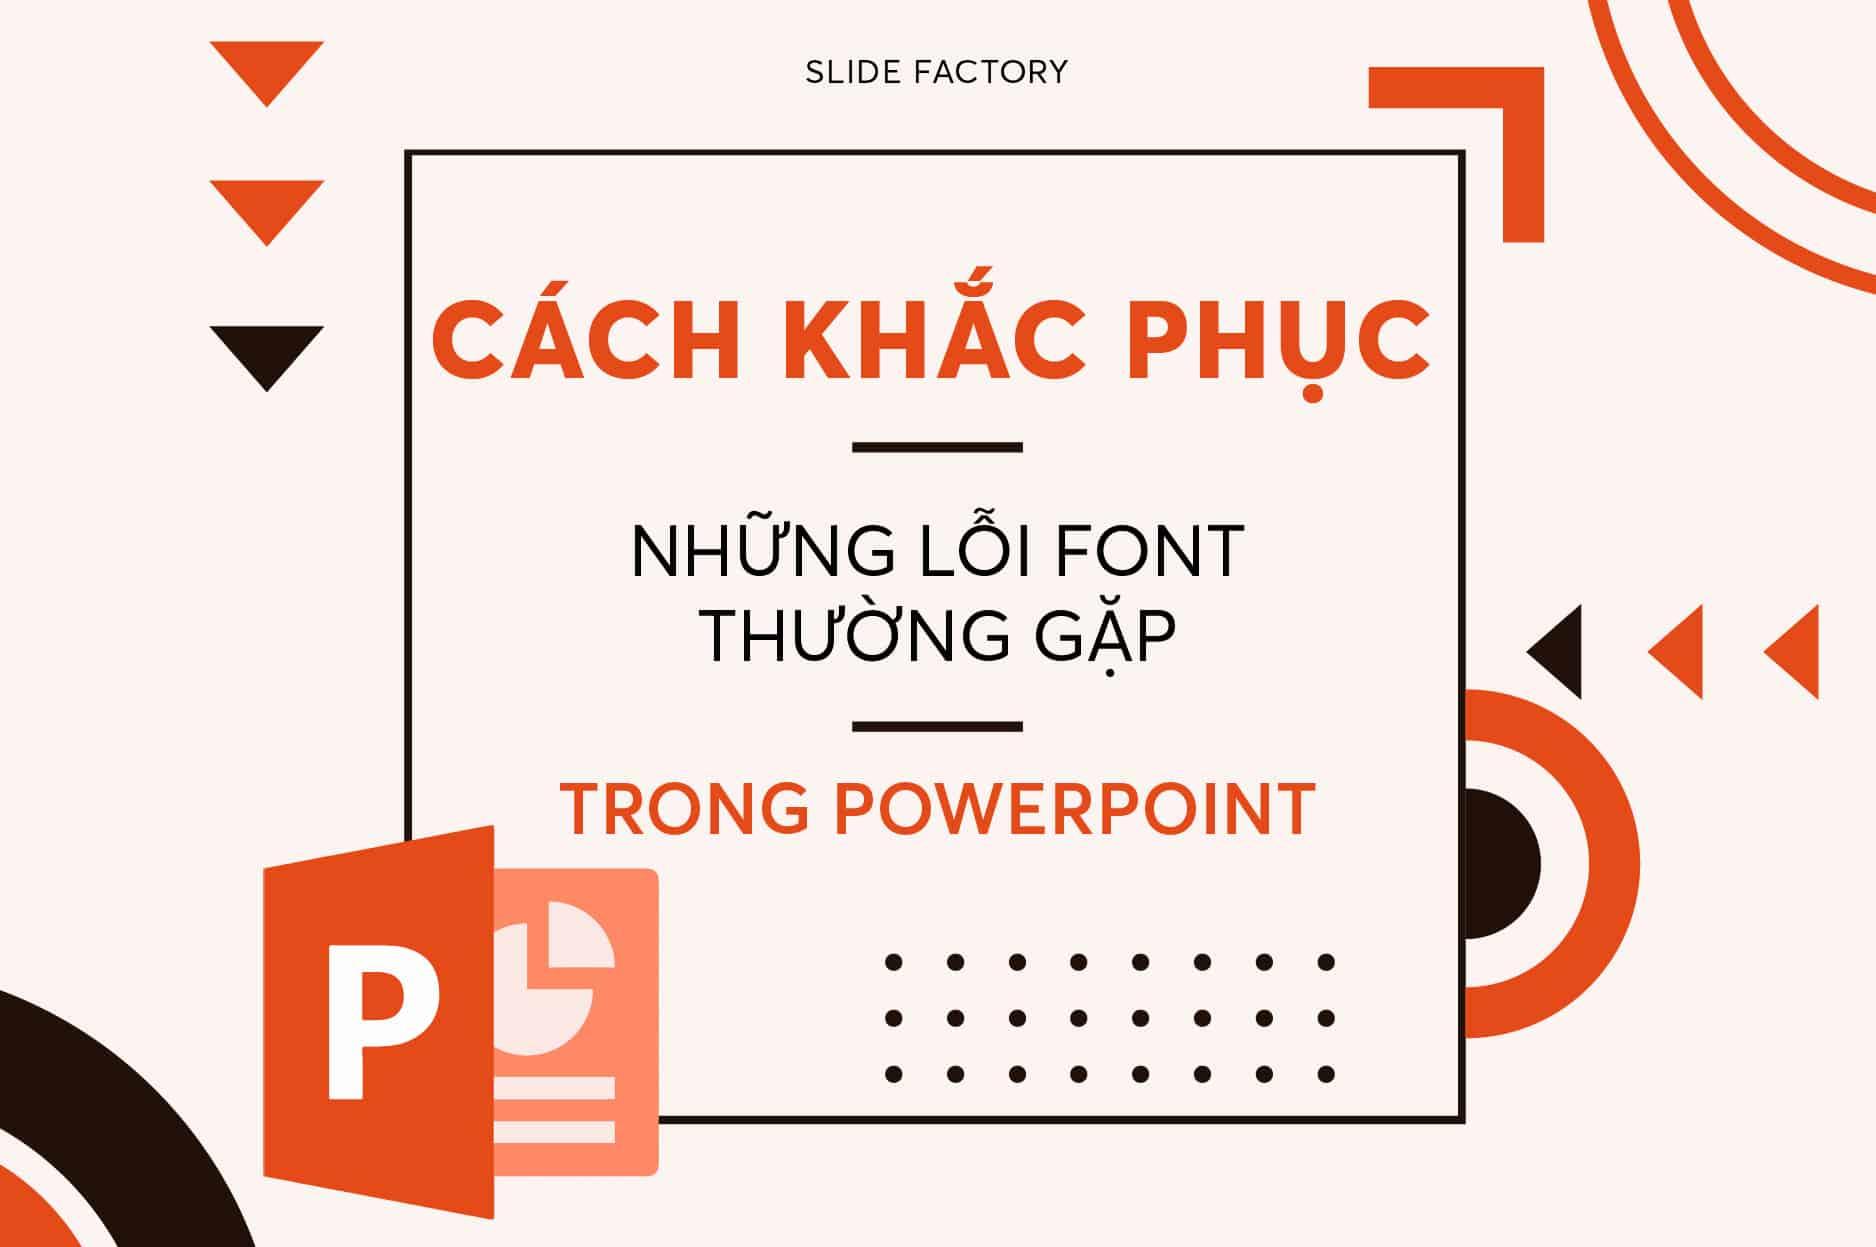 Cách khắc phục lỗi font chữ trong Powerpoint - Slidefactory